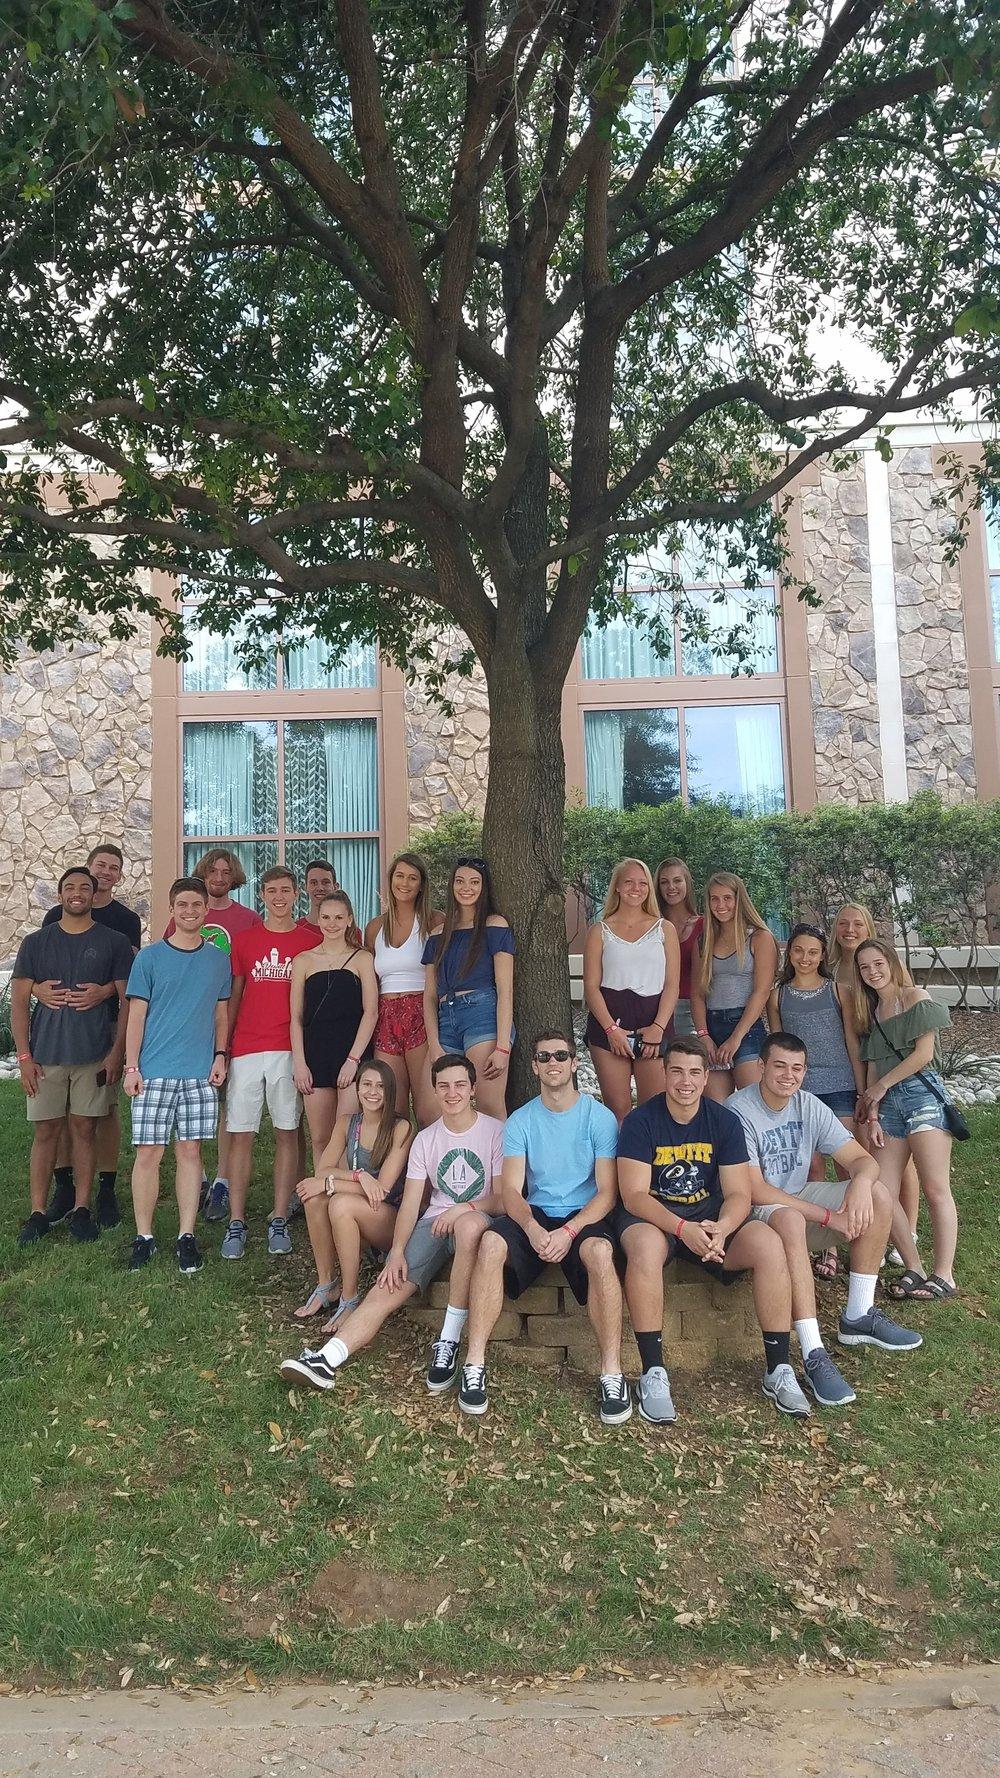 DeWitt High School - 2018 NLC